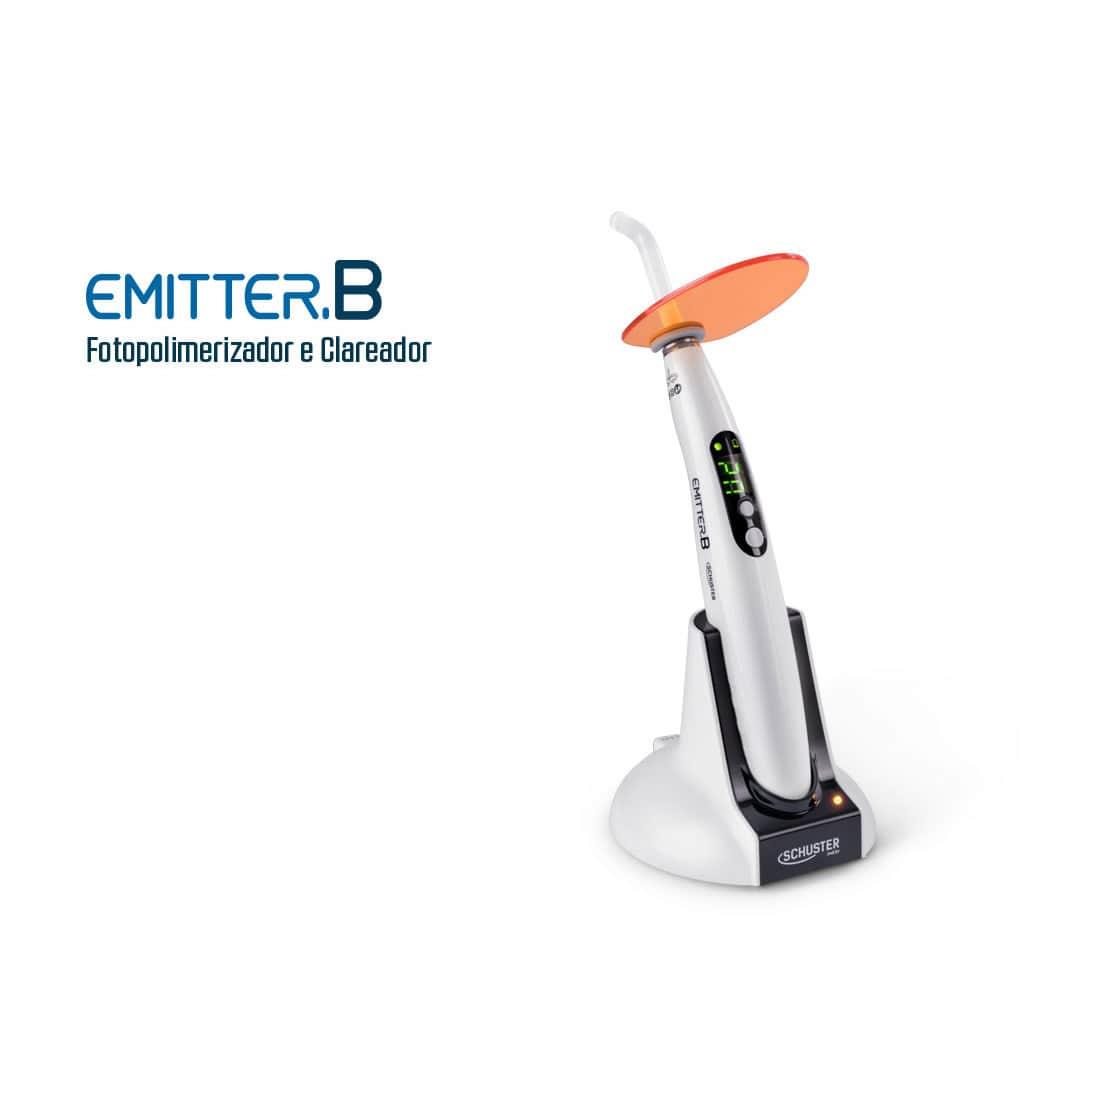 Fotopolimerizador Emitter B Wireless (Sem fio) - Schuster